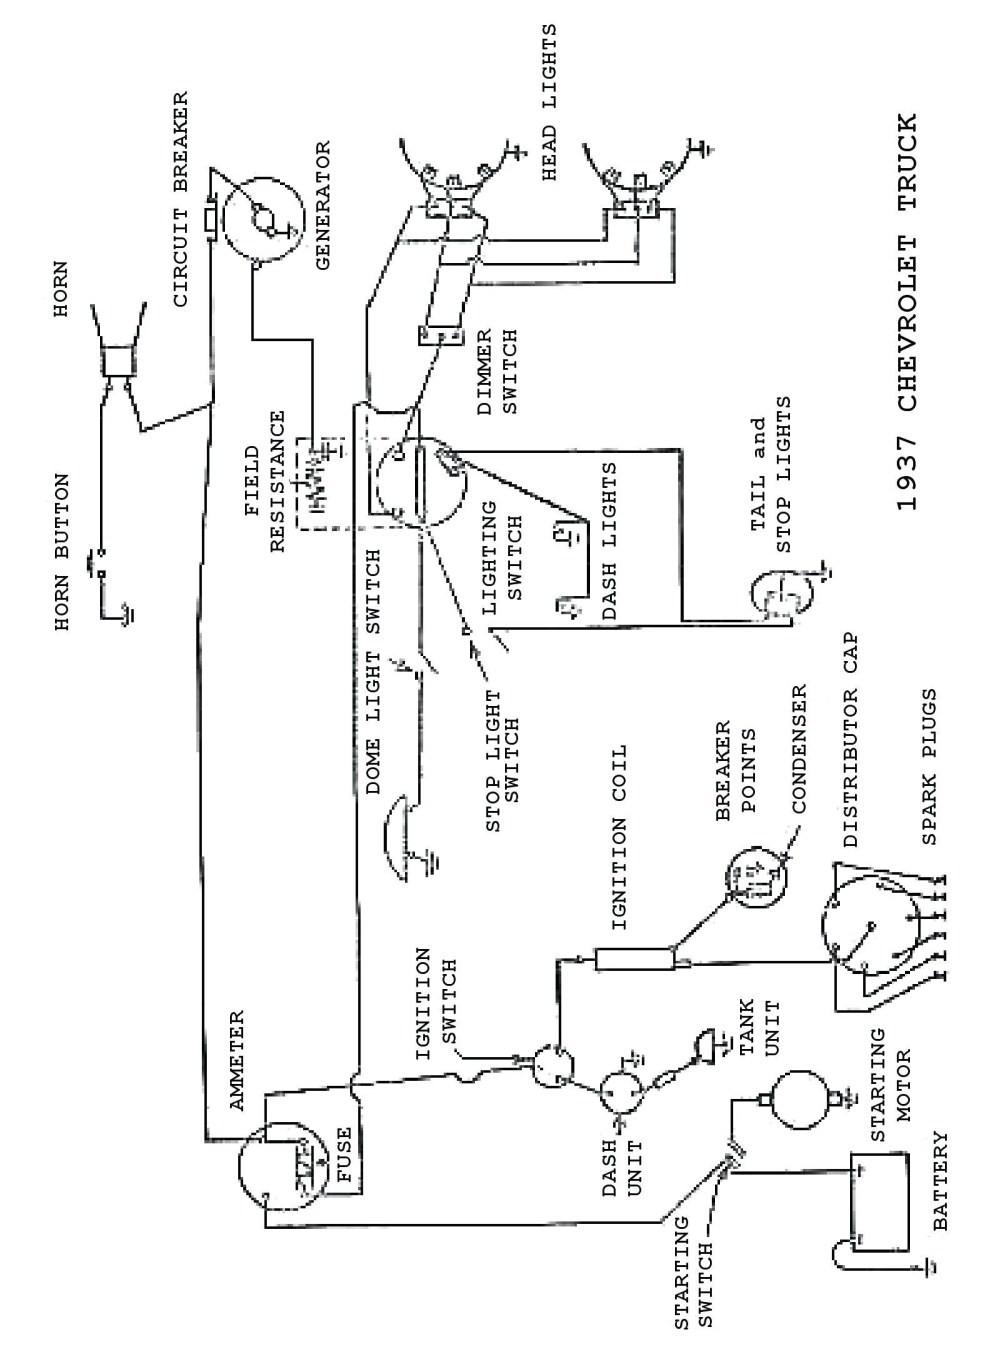 john deere 4020 12 volt wiring diagram inspirational amazing 24 volt starter wiring diagram contemporary everything you of john deere 4020 12 volt wiring diagram